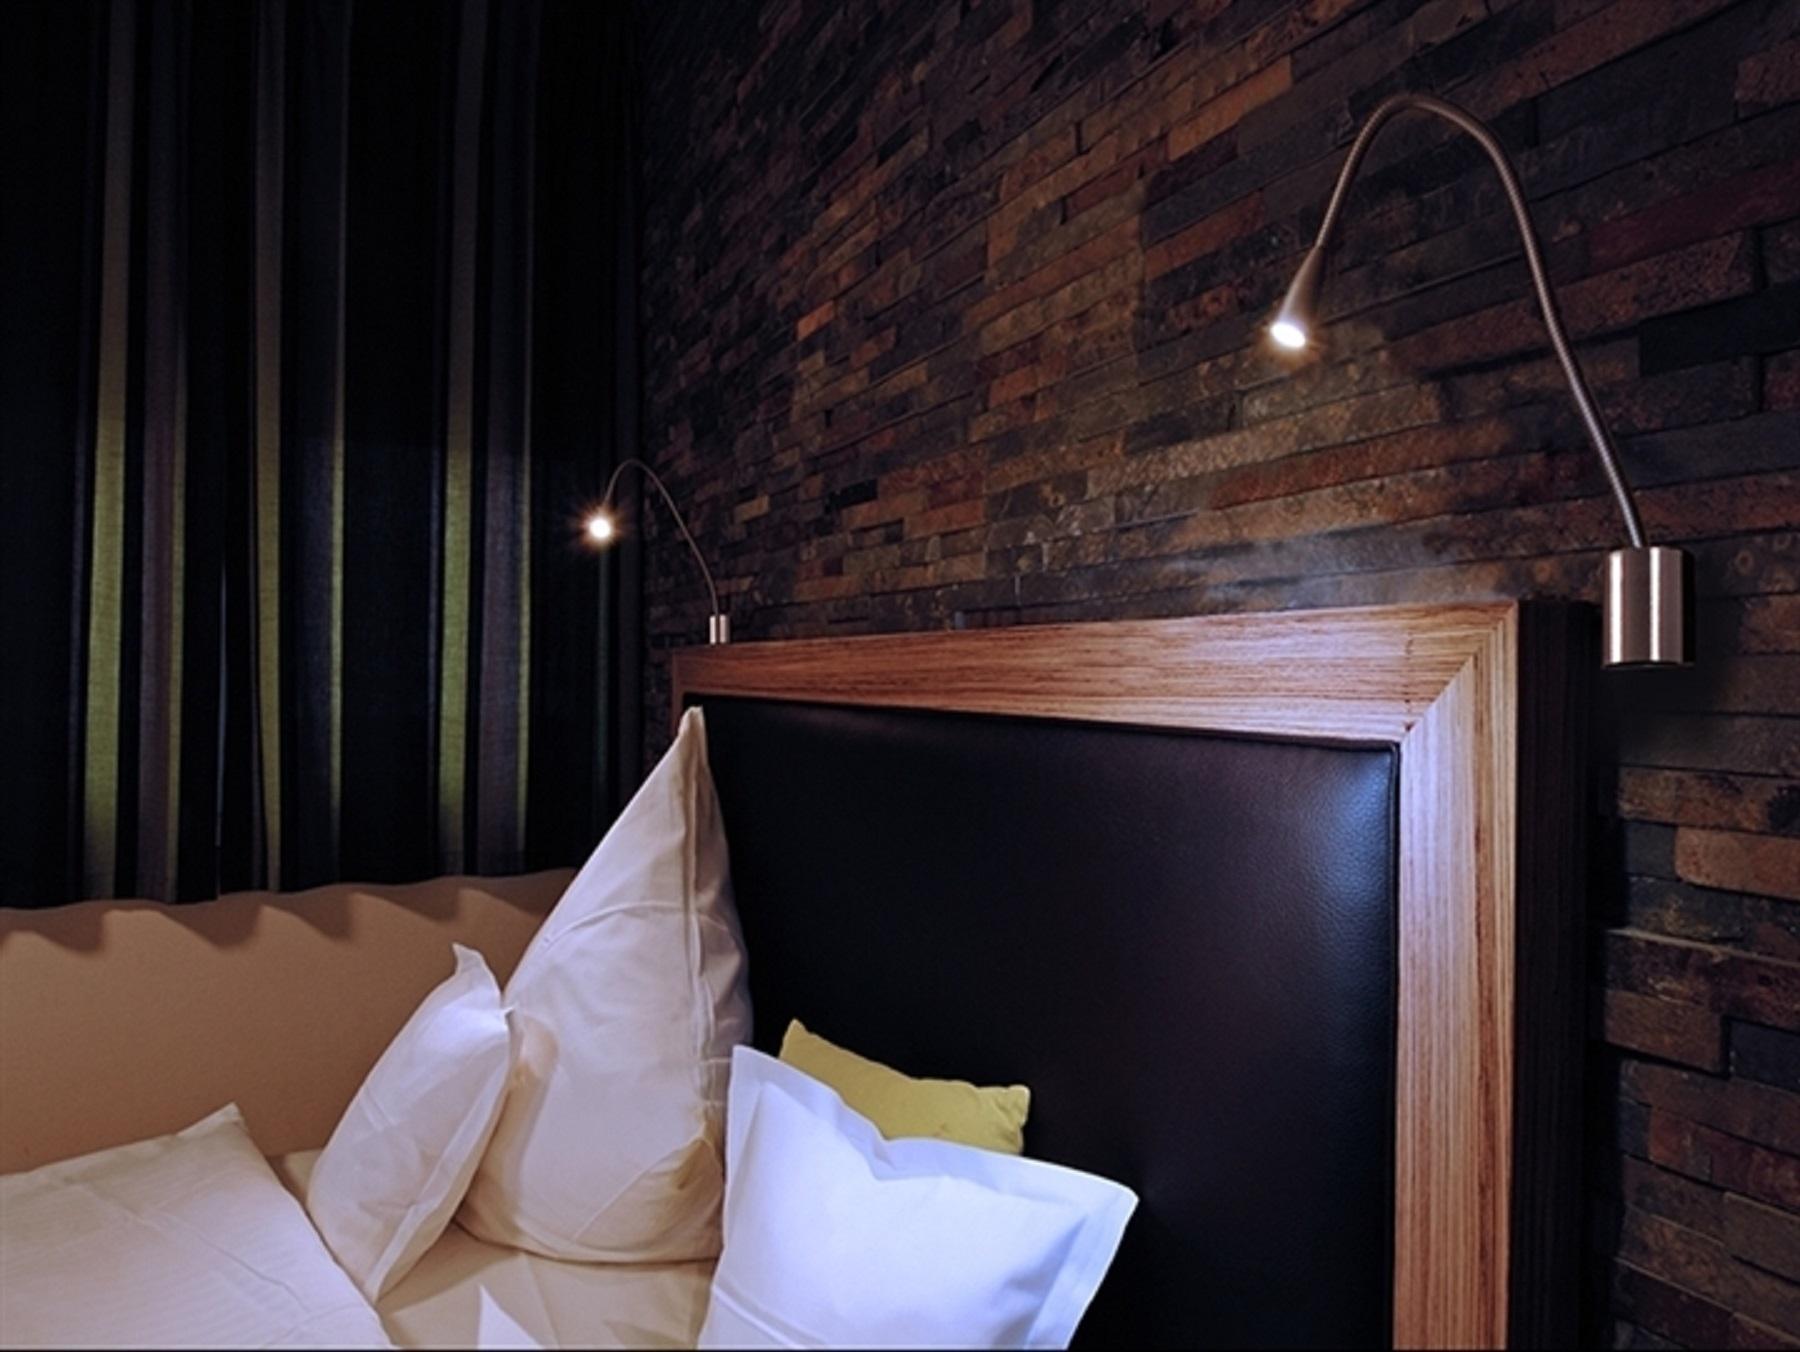 Lampada da lettura led braccio flessibile w luce calda applique